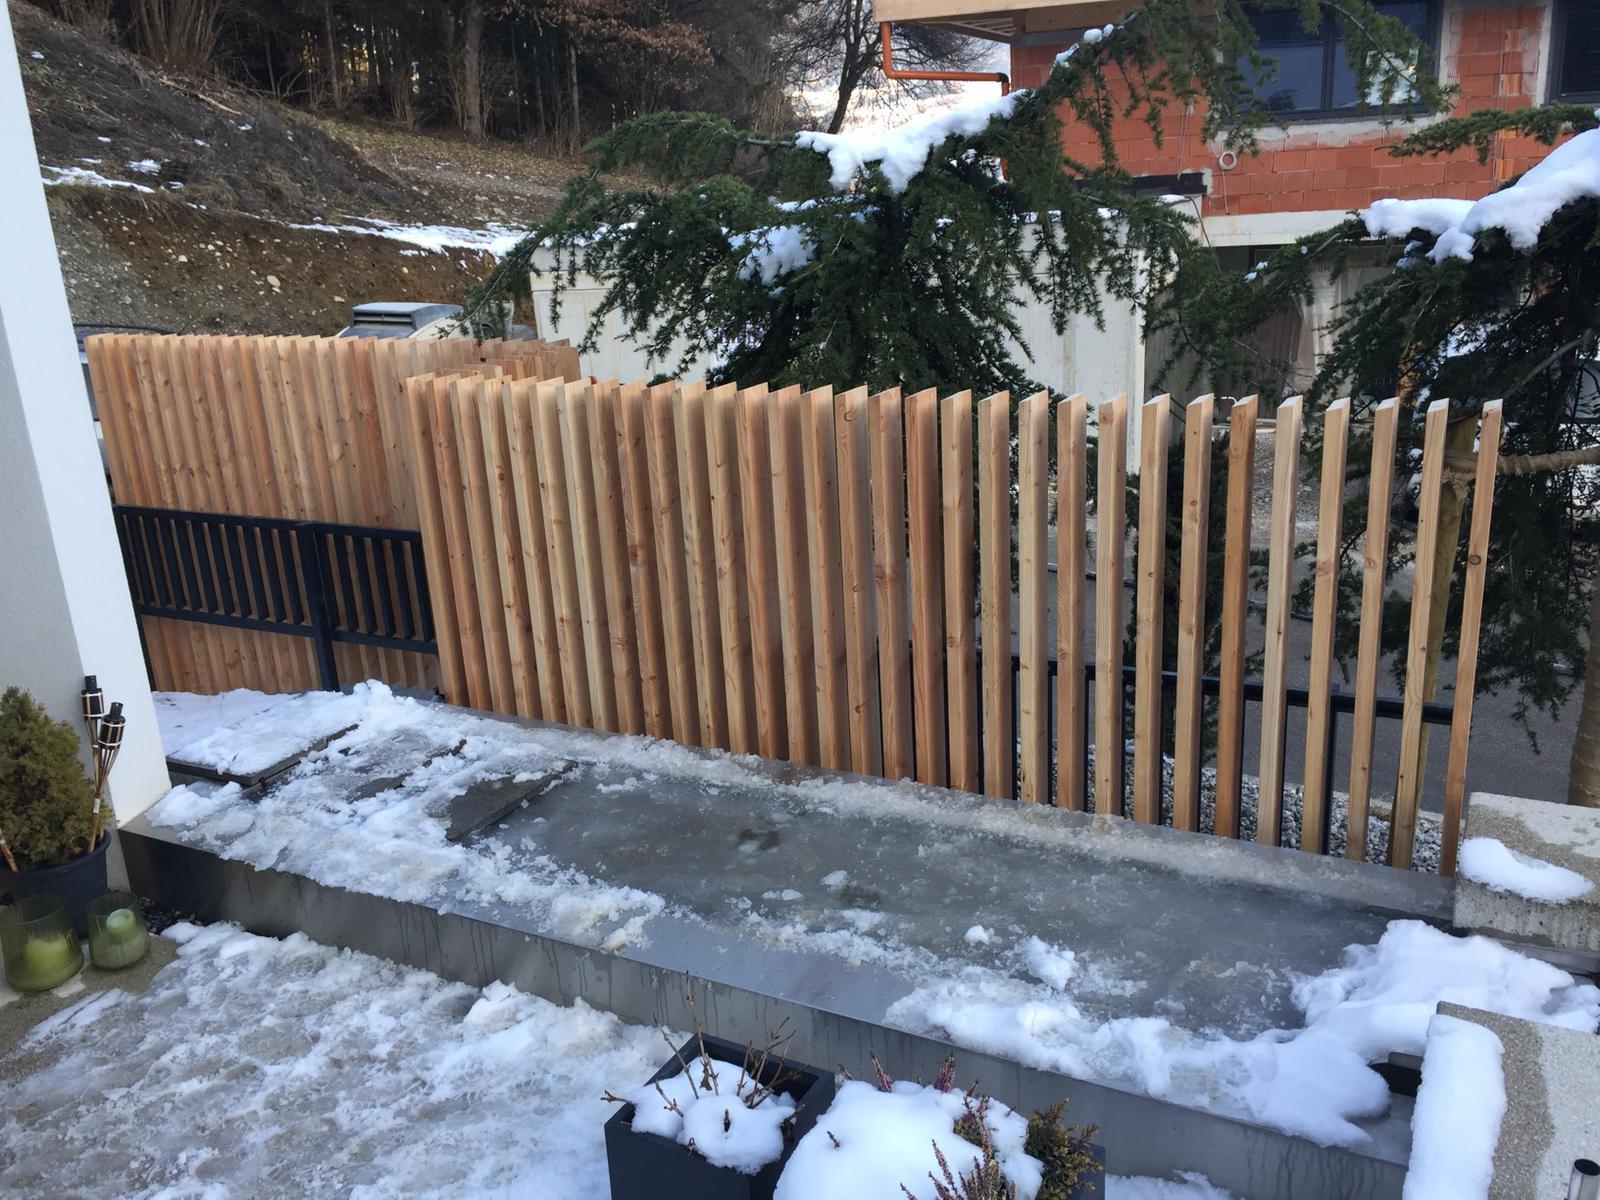 18-Holz-Zaun-2018-Norz-Thaur.JPG